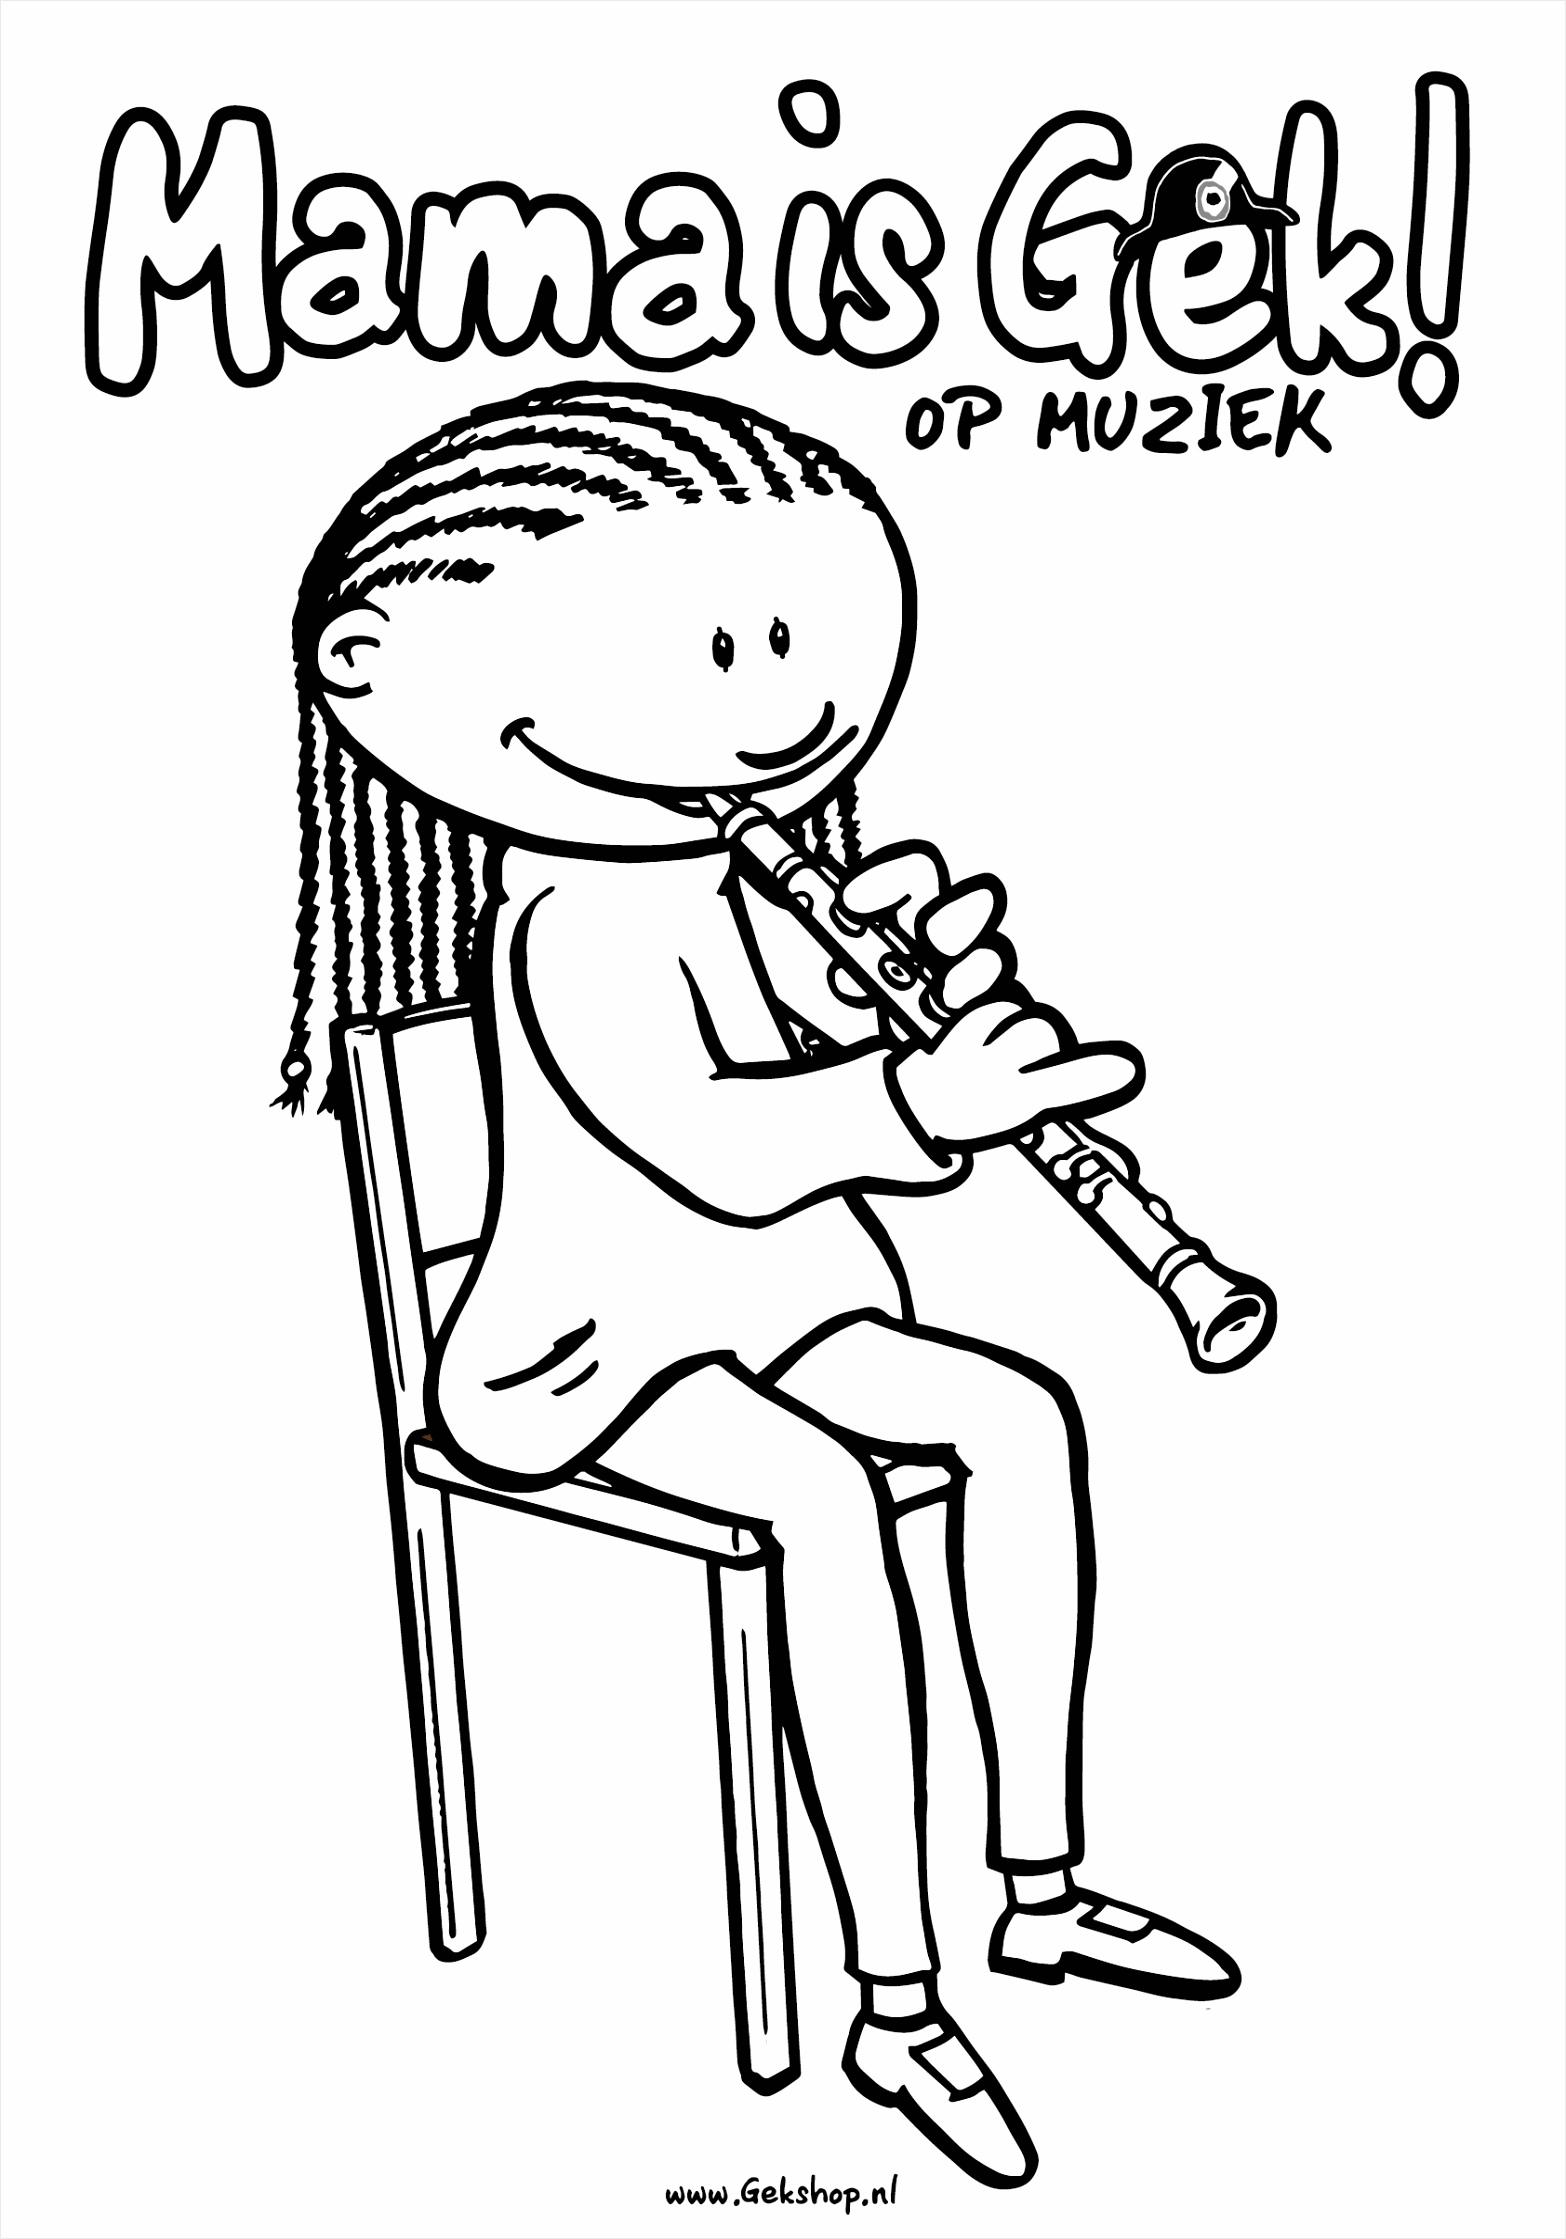 Mama is gek op muziek kleurplaat klarinet urttt